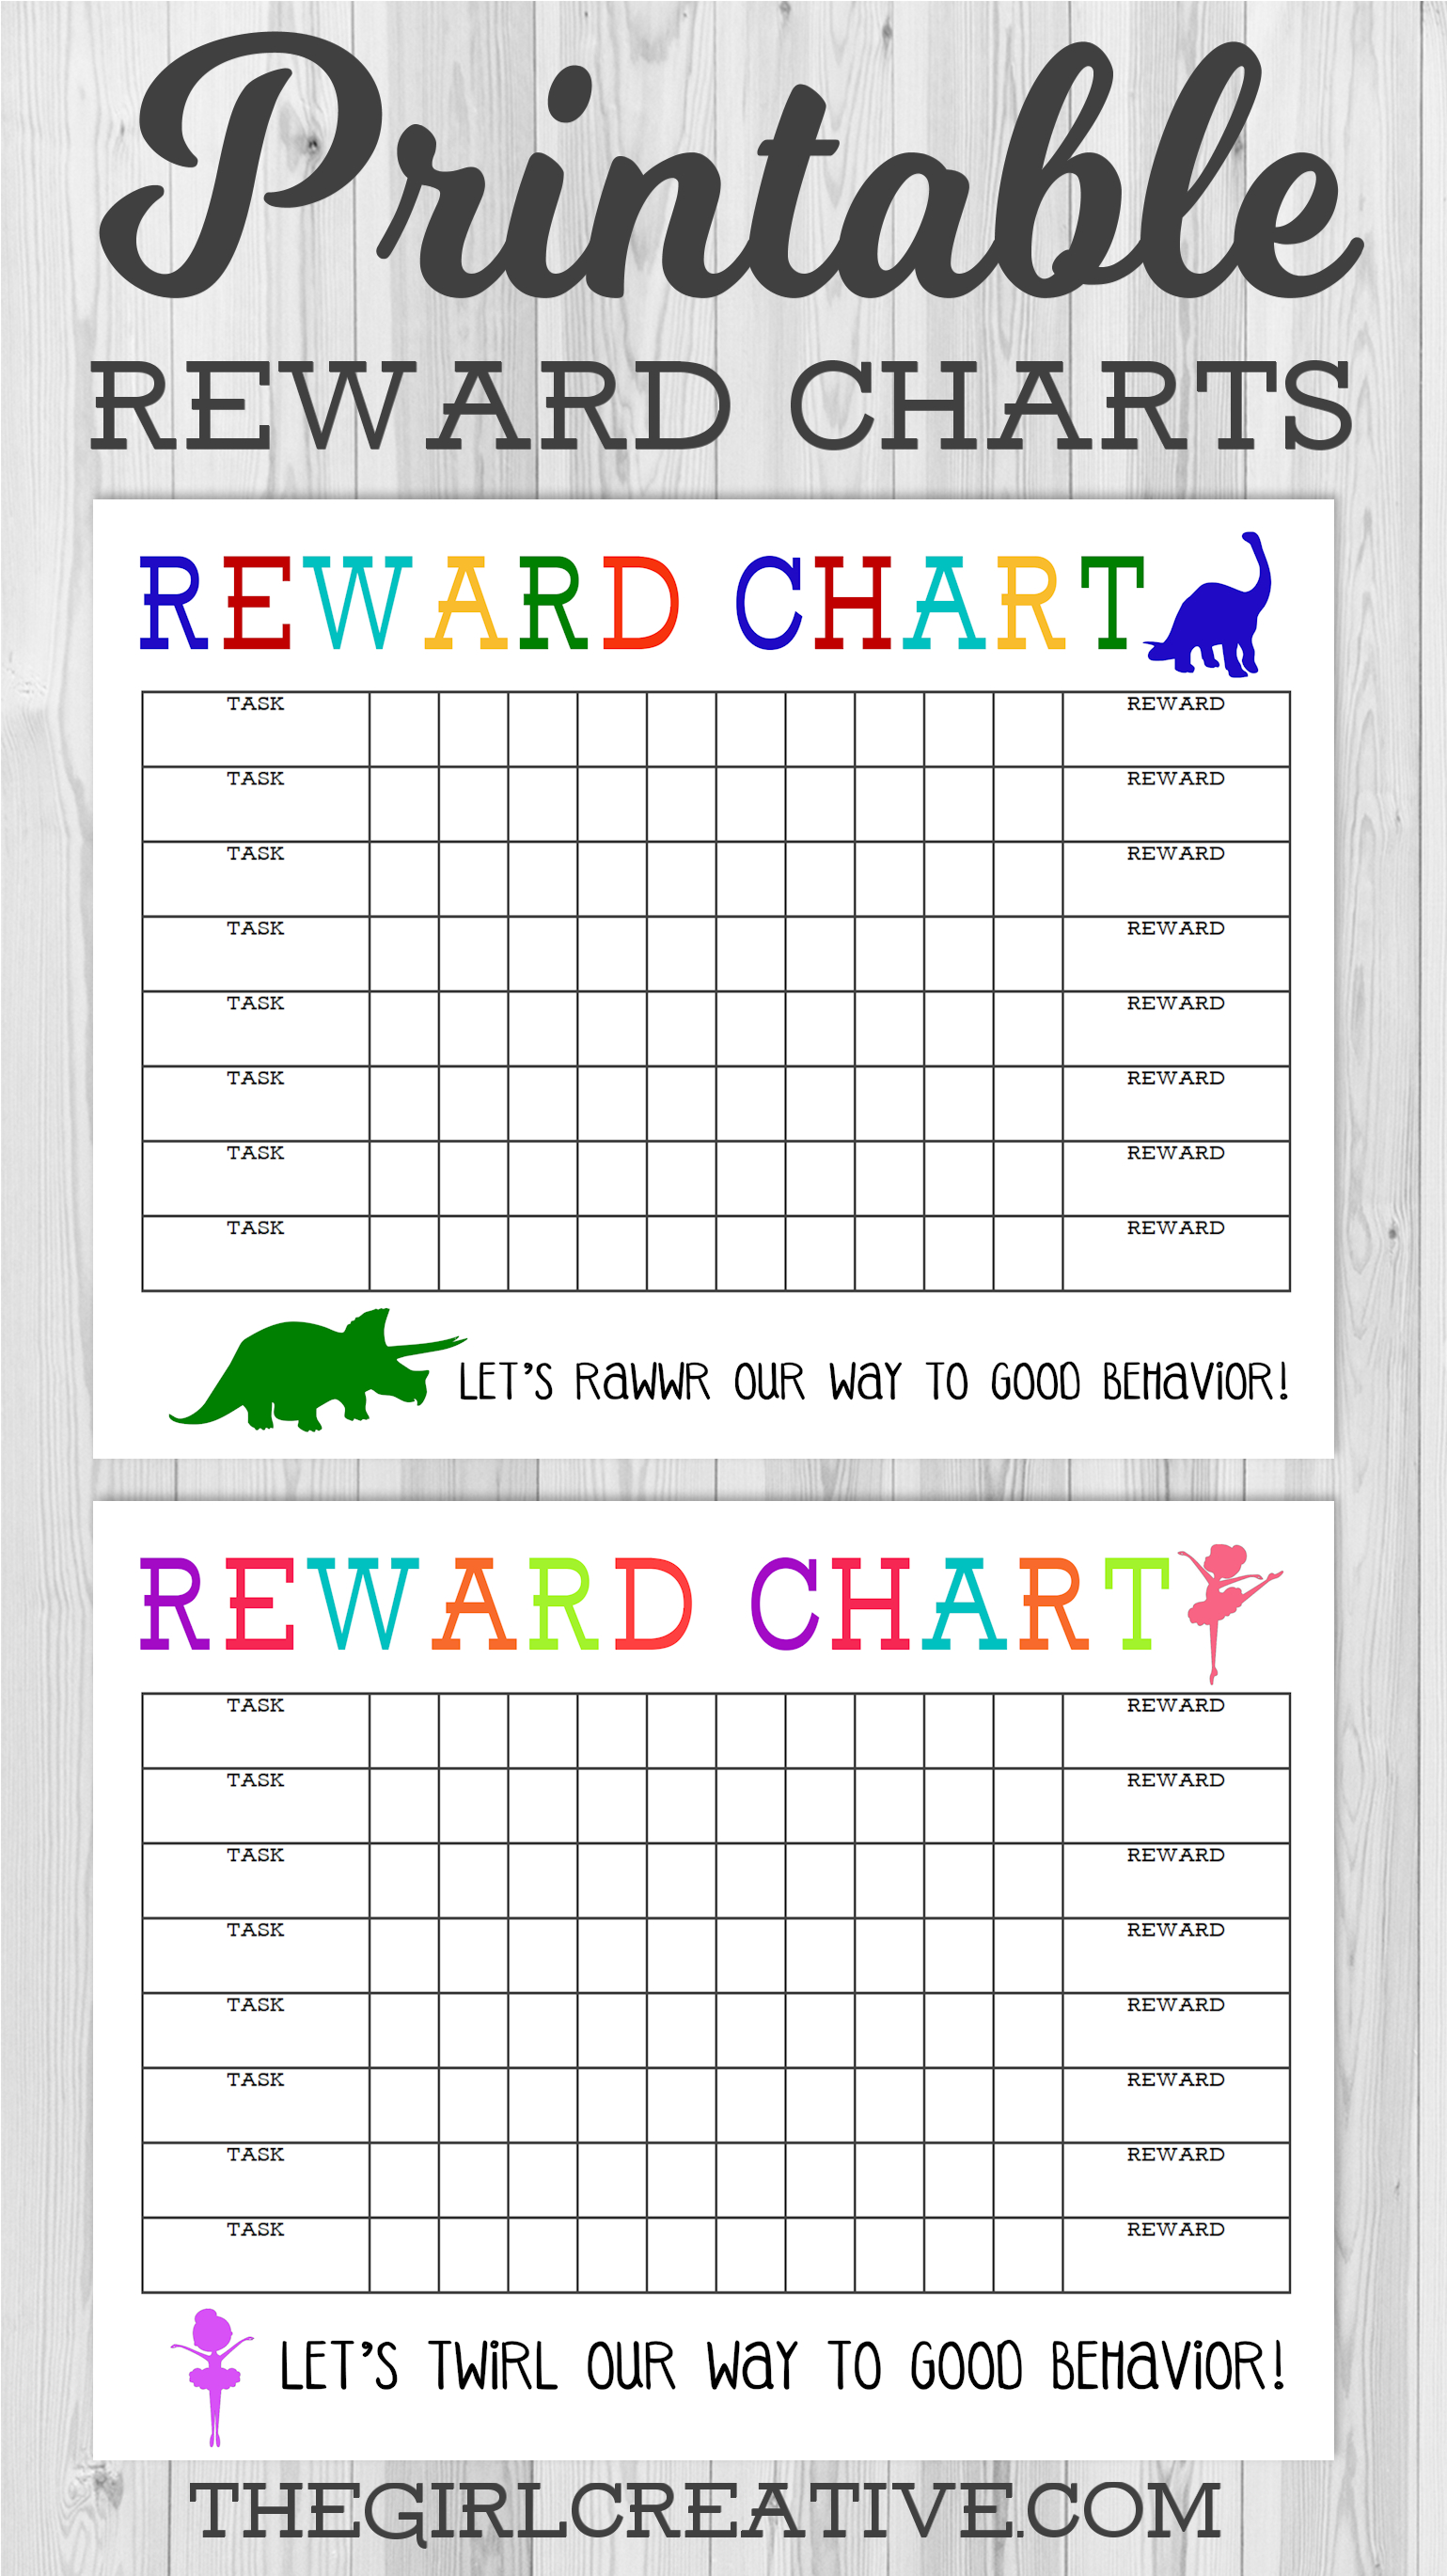 Printable Reward Chart - The Girl Creative - Free Printable Incentive Charts For Students